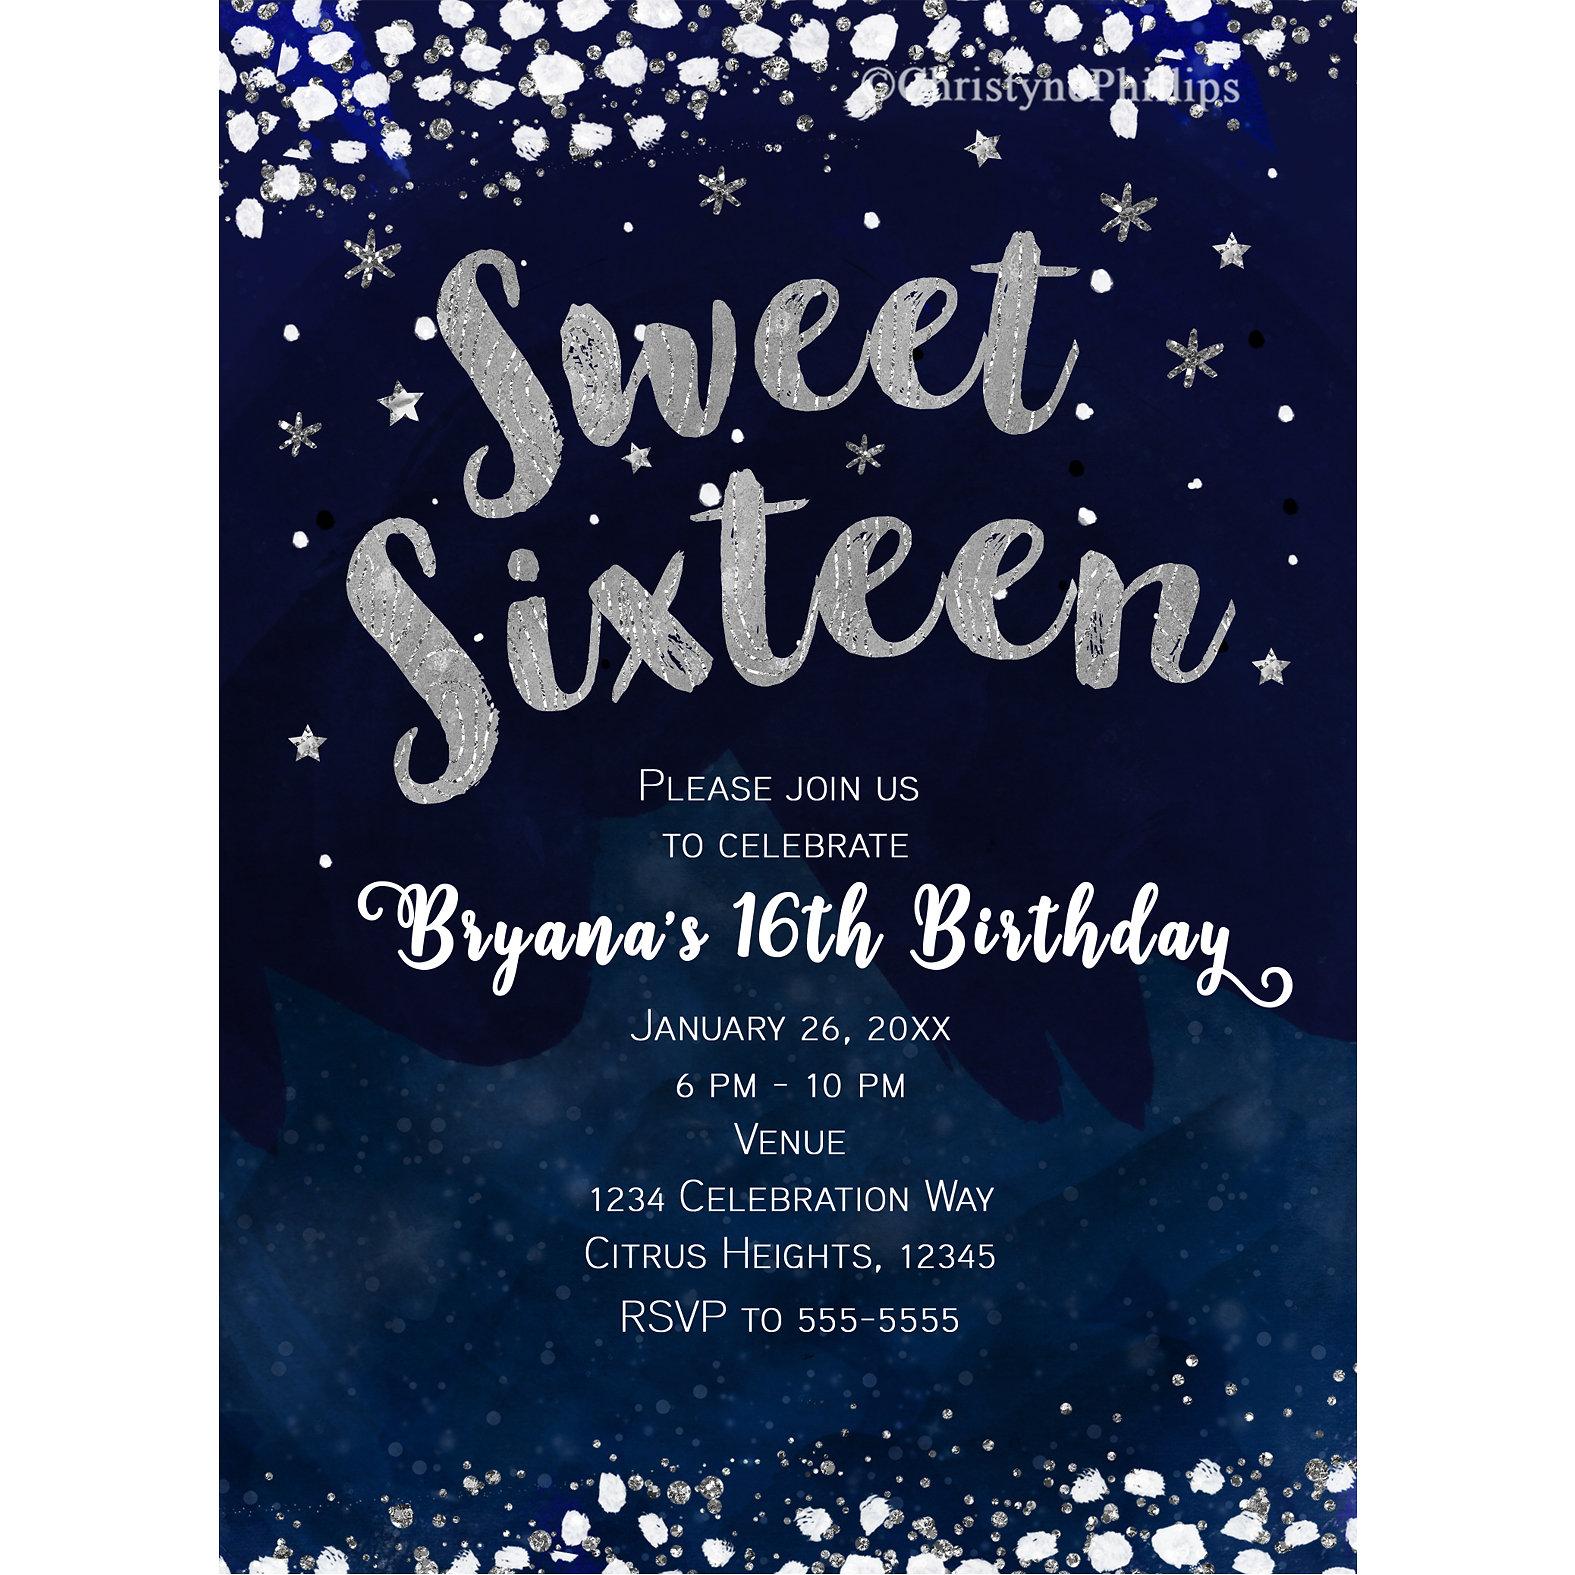 Printable Digi Designs | Personalized Digital Party Invitations ...